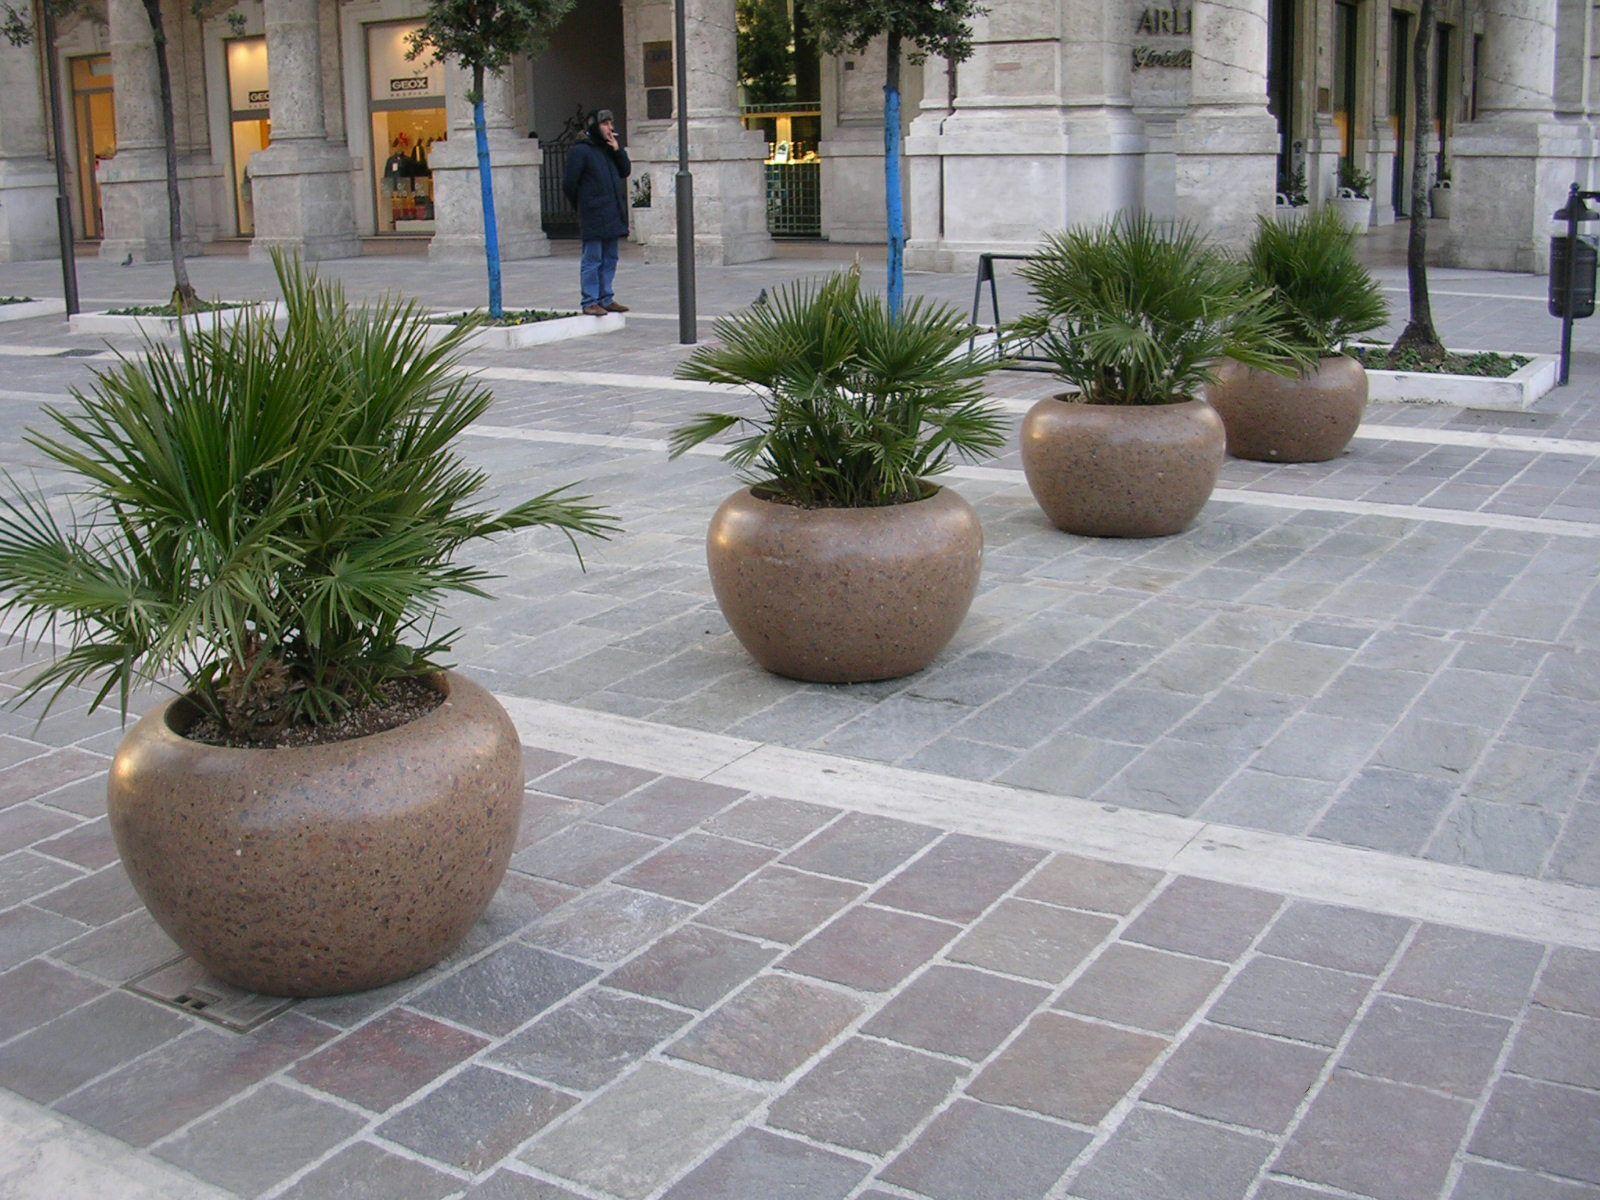 Luna planter bellitalia marble and concrete street for Bellitalia arredo urbano